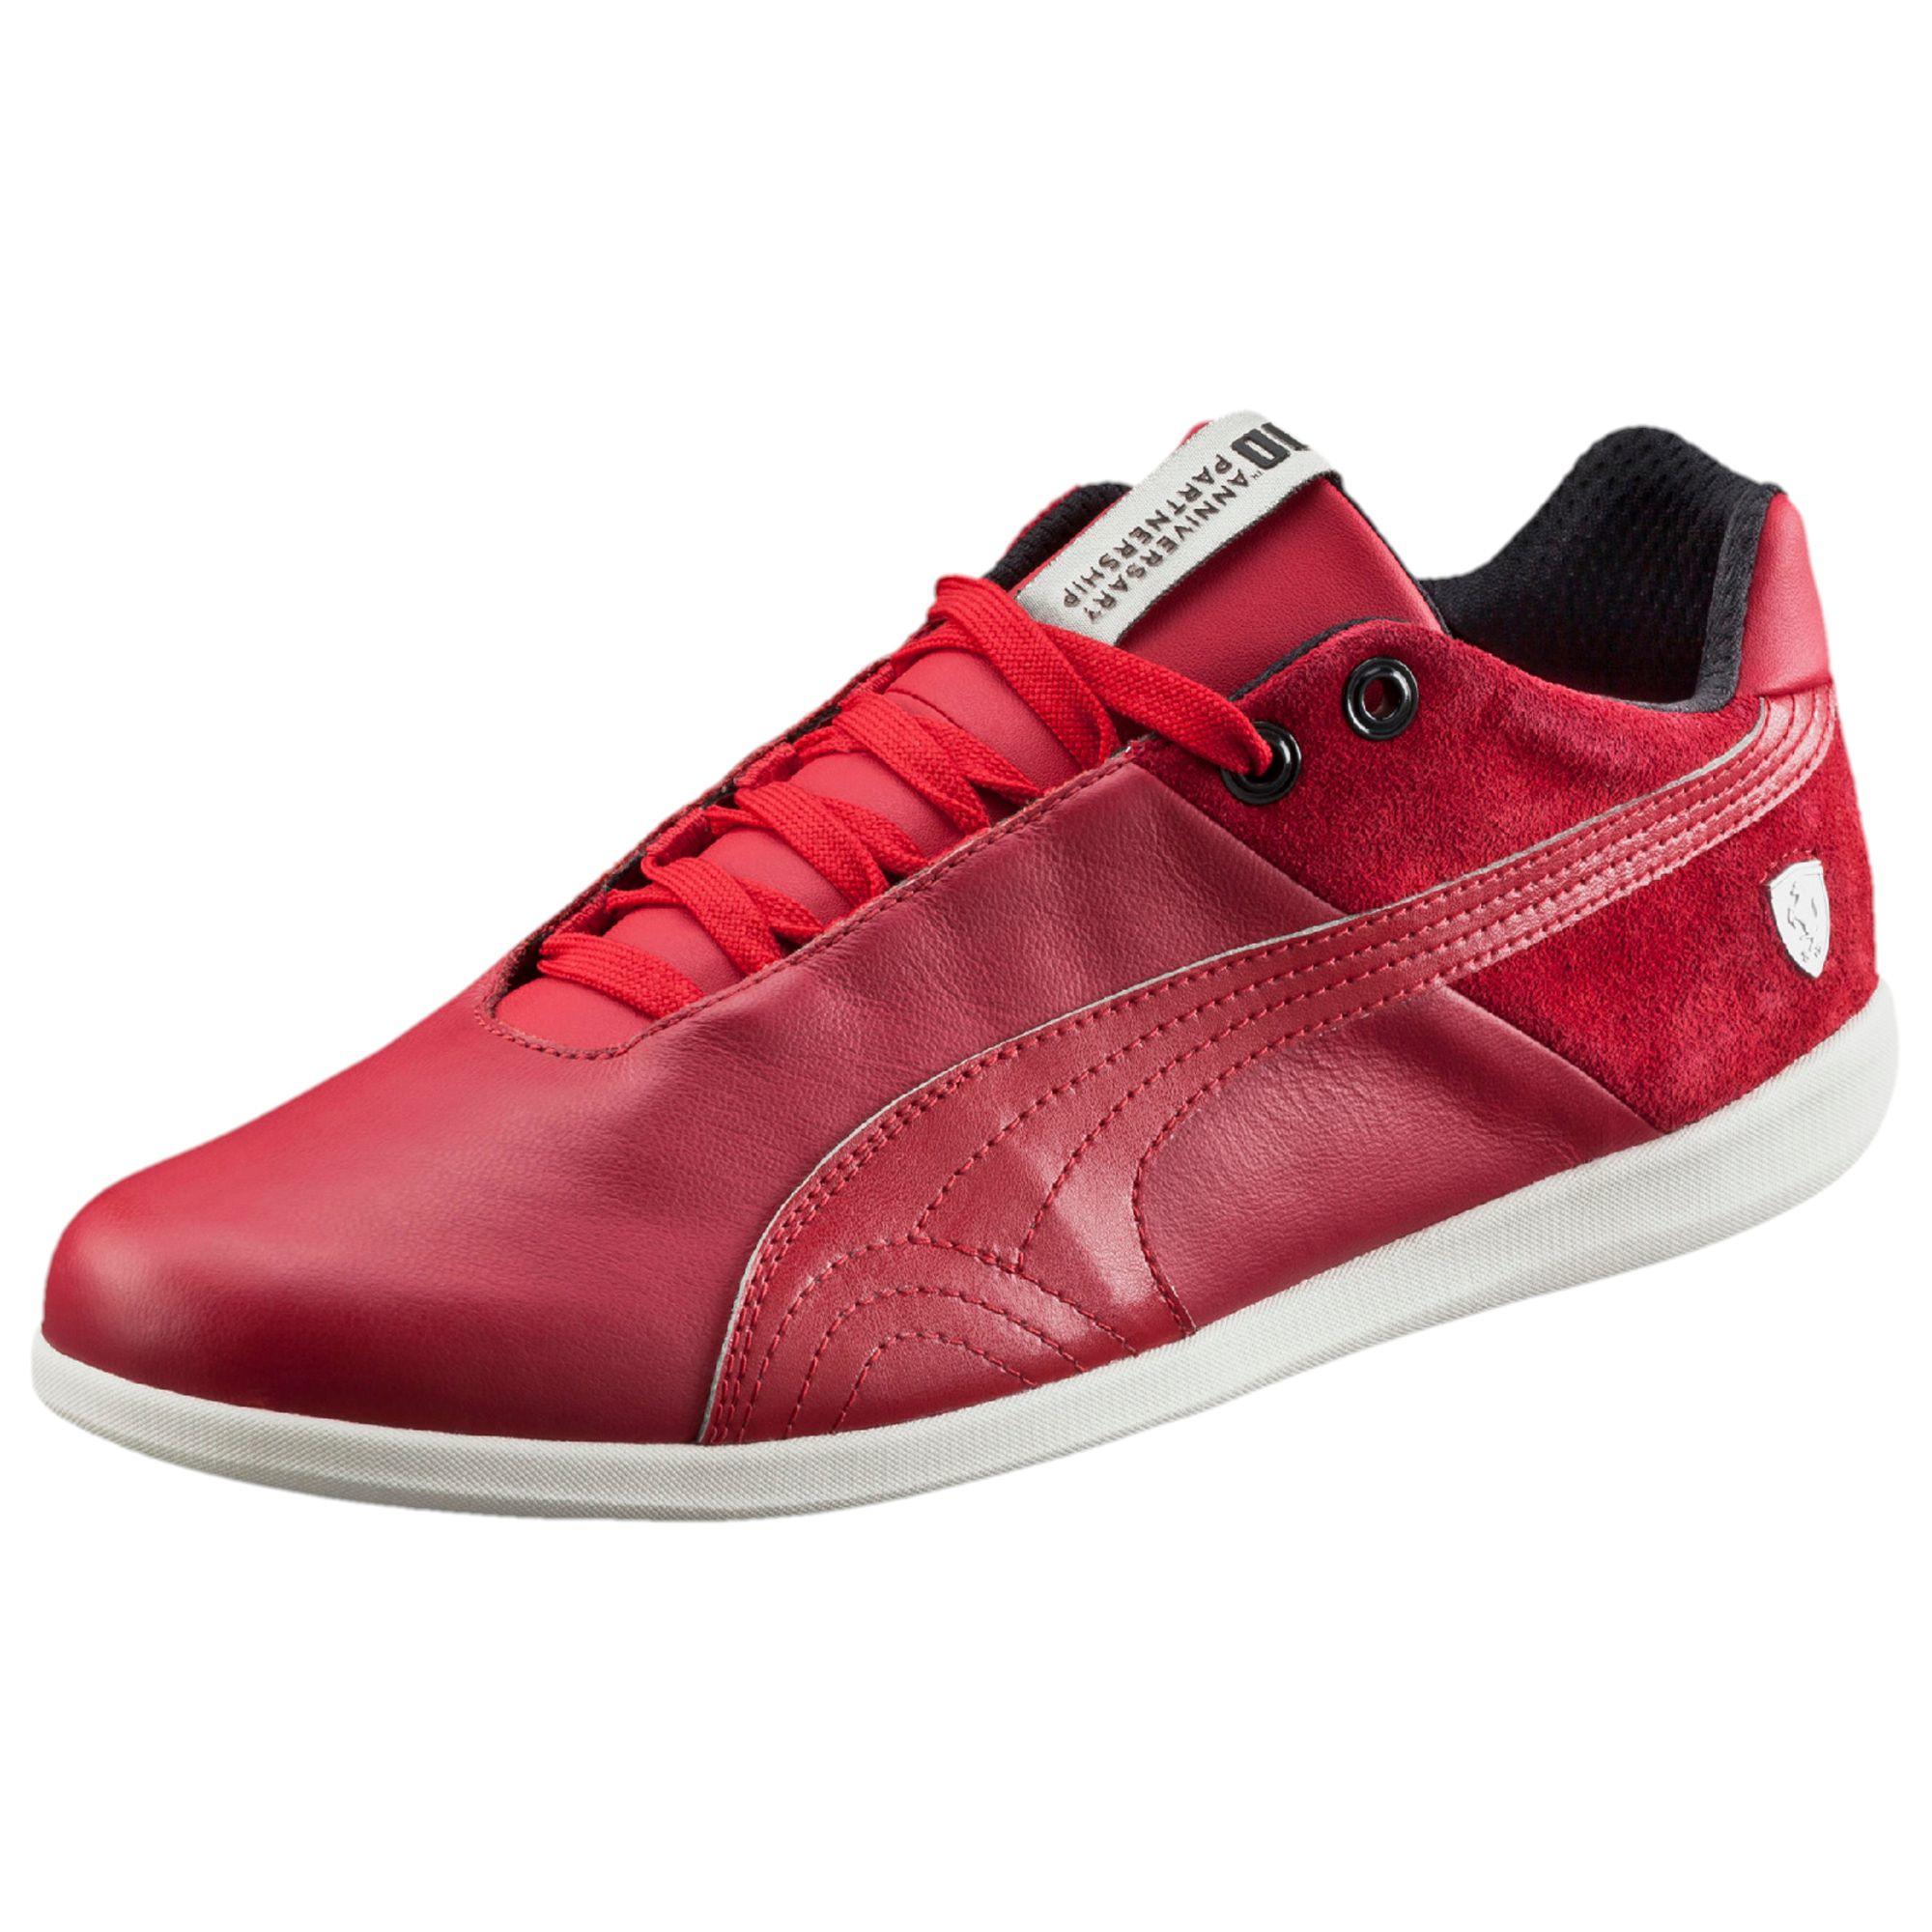 f8ee459284ab3d Lyst - PUMA Ferrari Future Cat 10 Lifestyle Men s Shoes in Red for Men